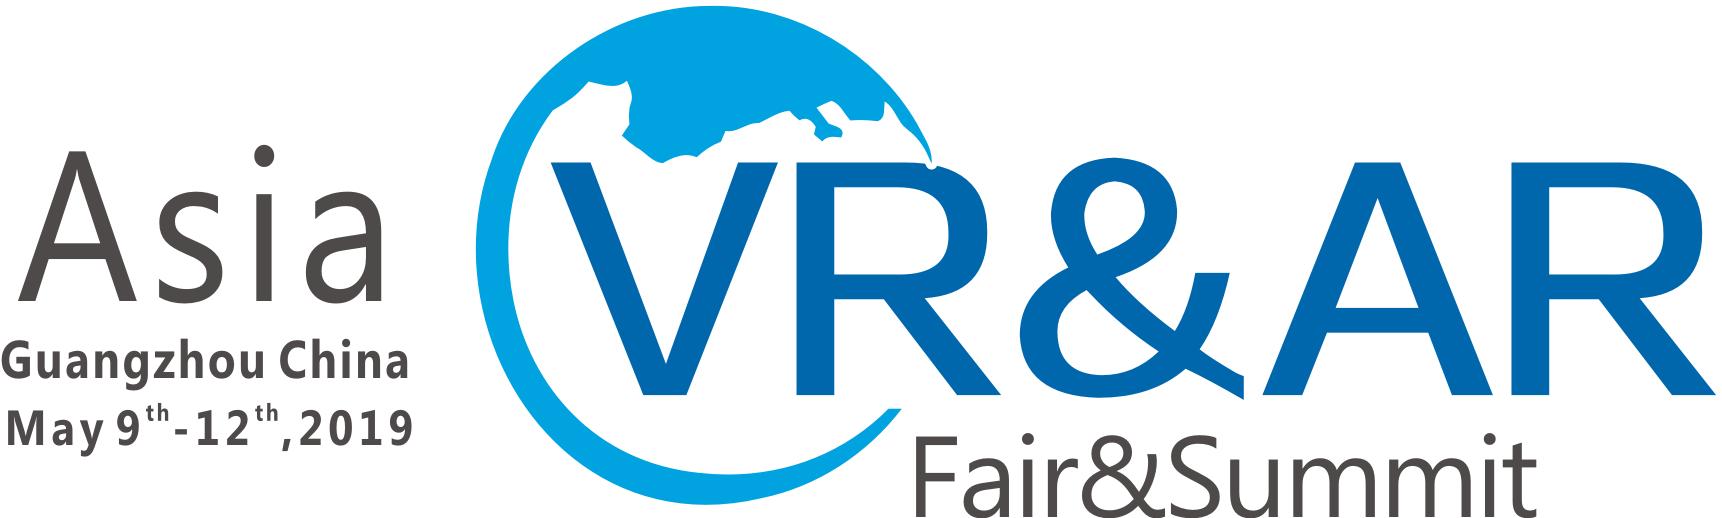 2019 Asia VR&AR Fair&Summit (VR&AR Fair 2019)